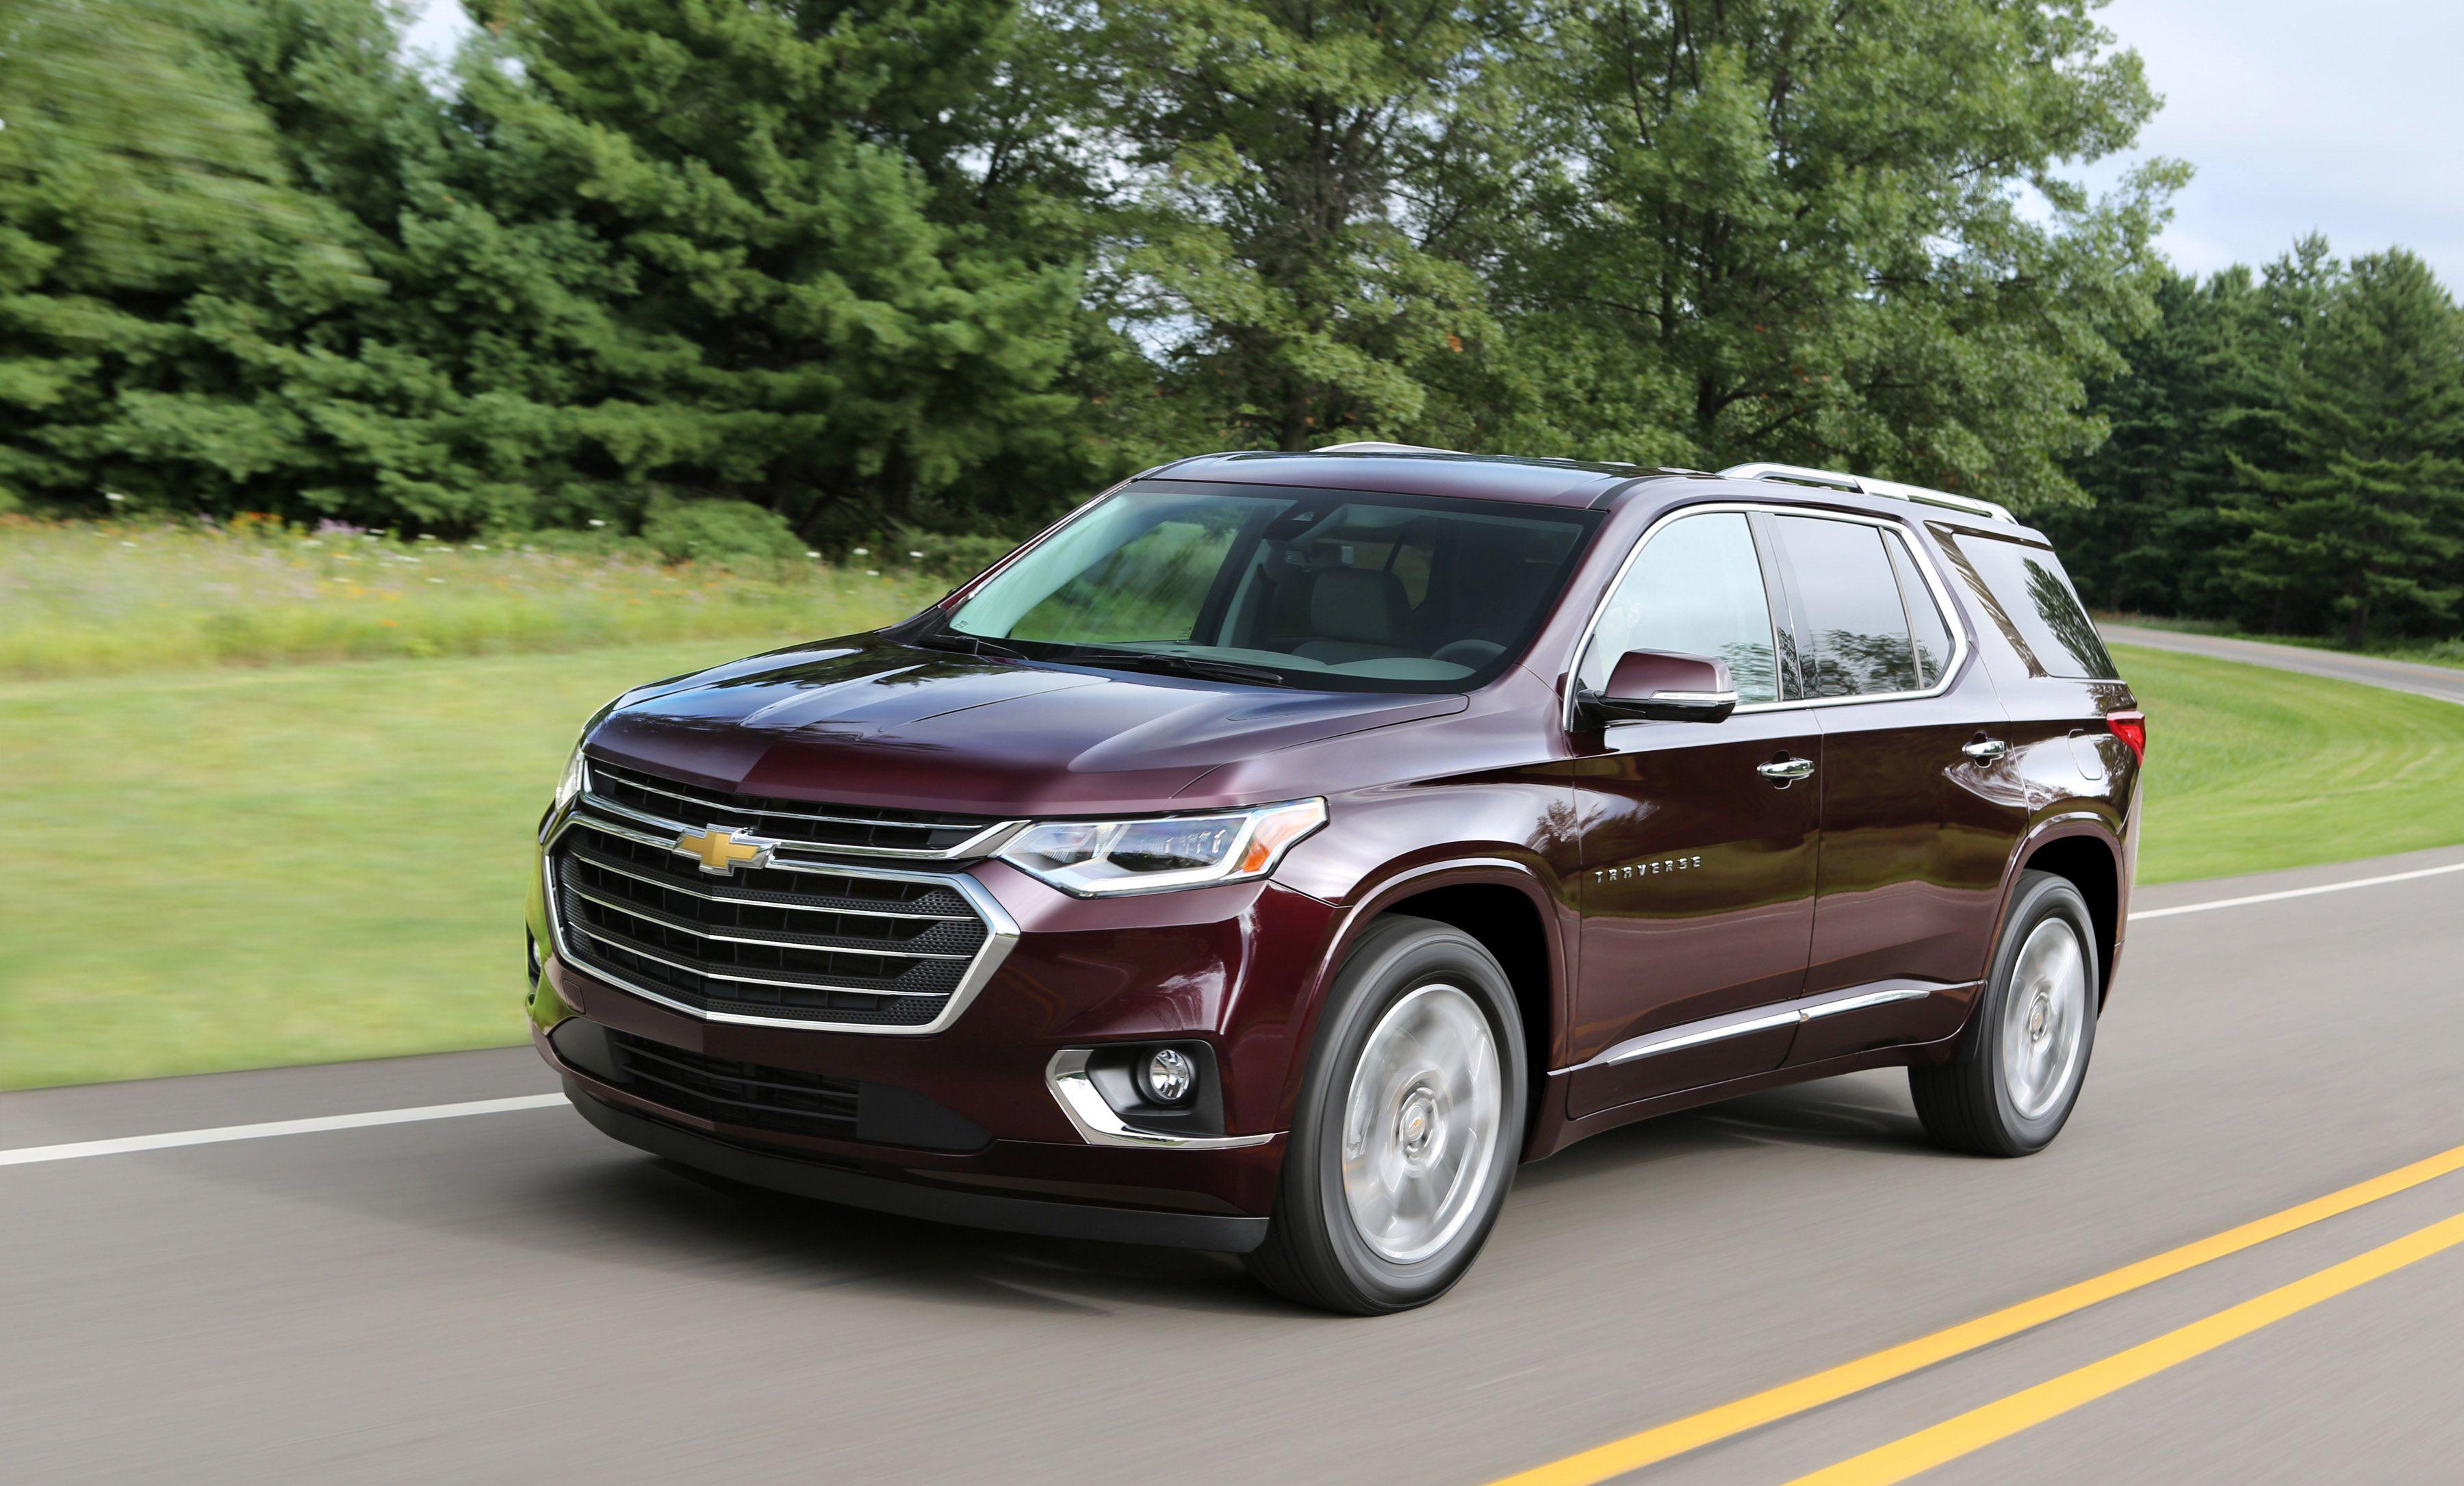 2018 Chevrolet Traverse Financing near Merriville, IN